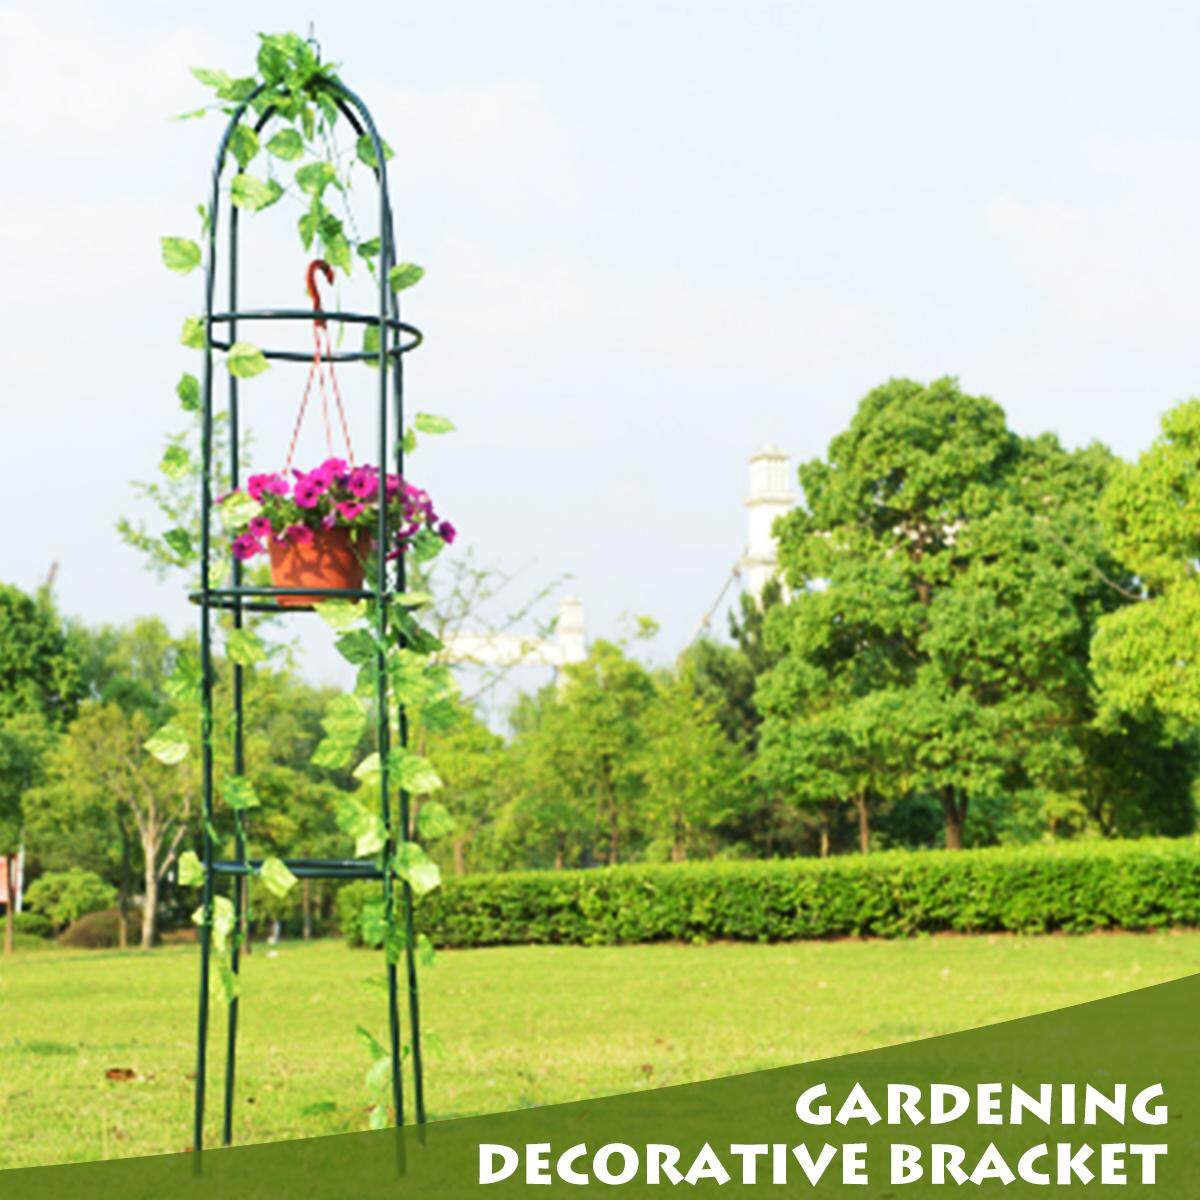 Gardening Stand Flower Display Climbing Plant Racks Vine Holder Support Frame